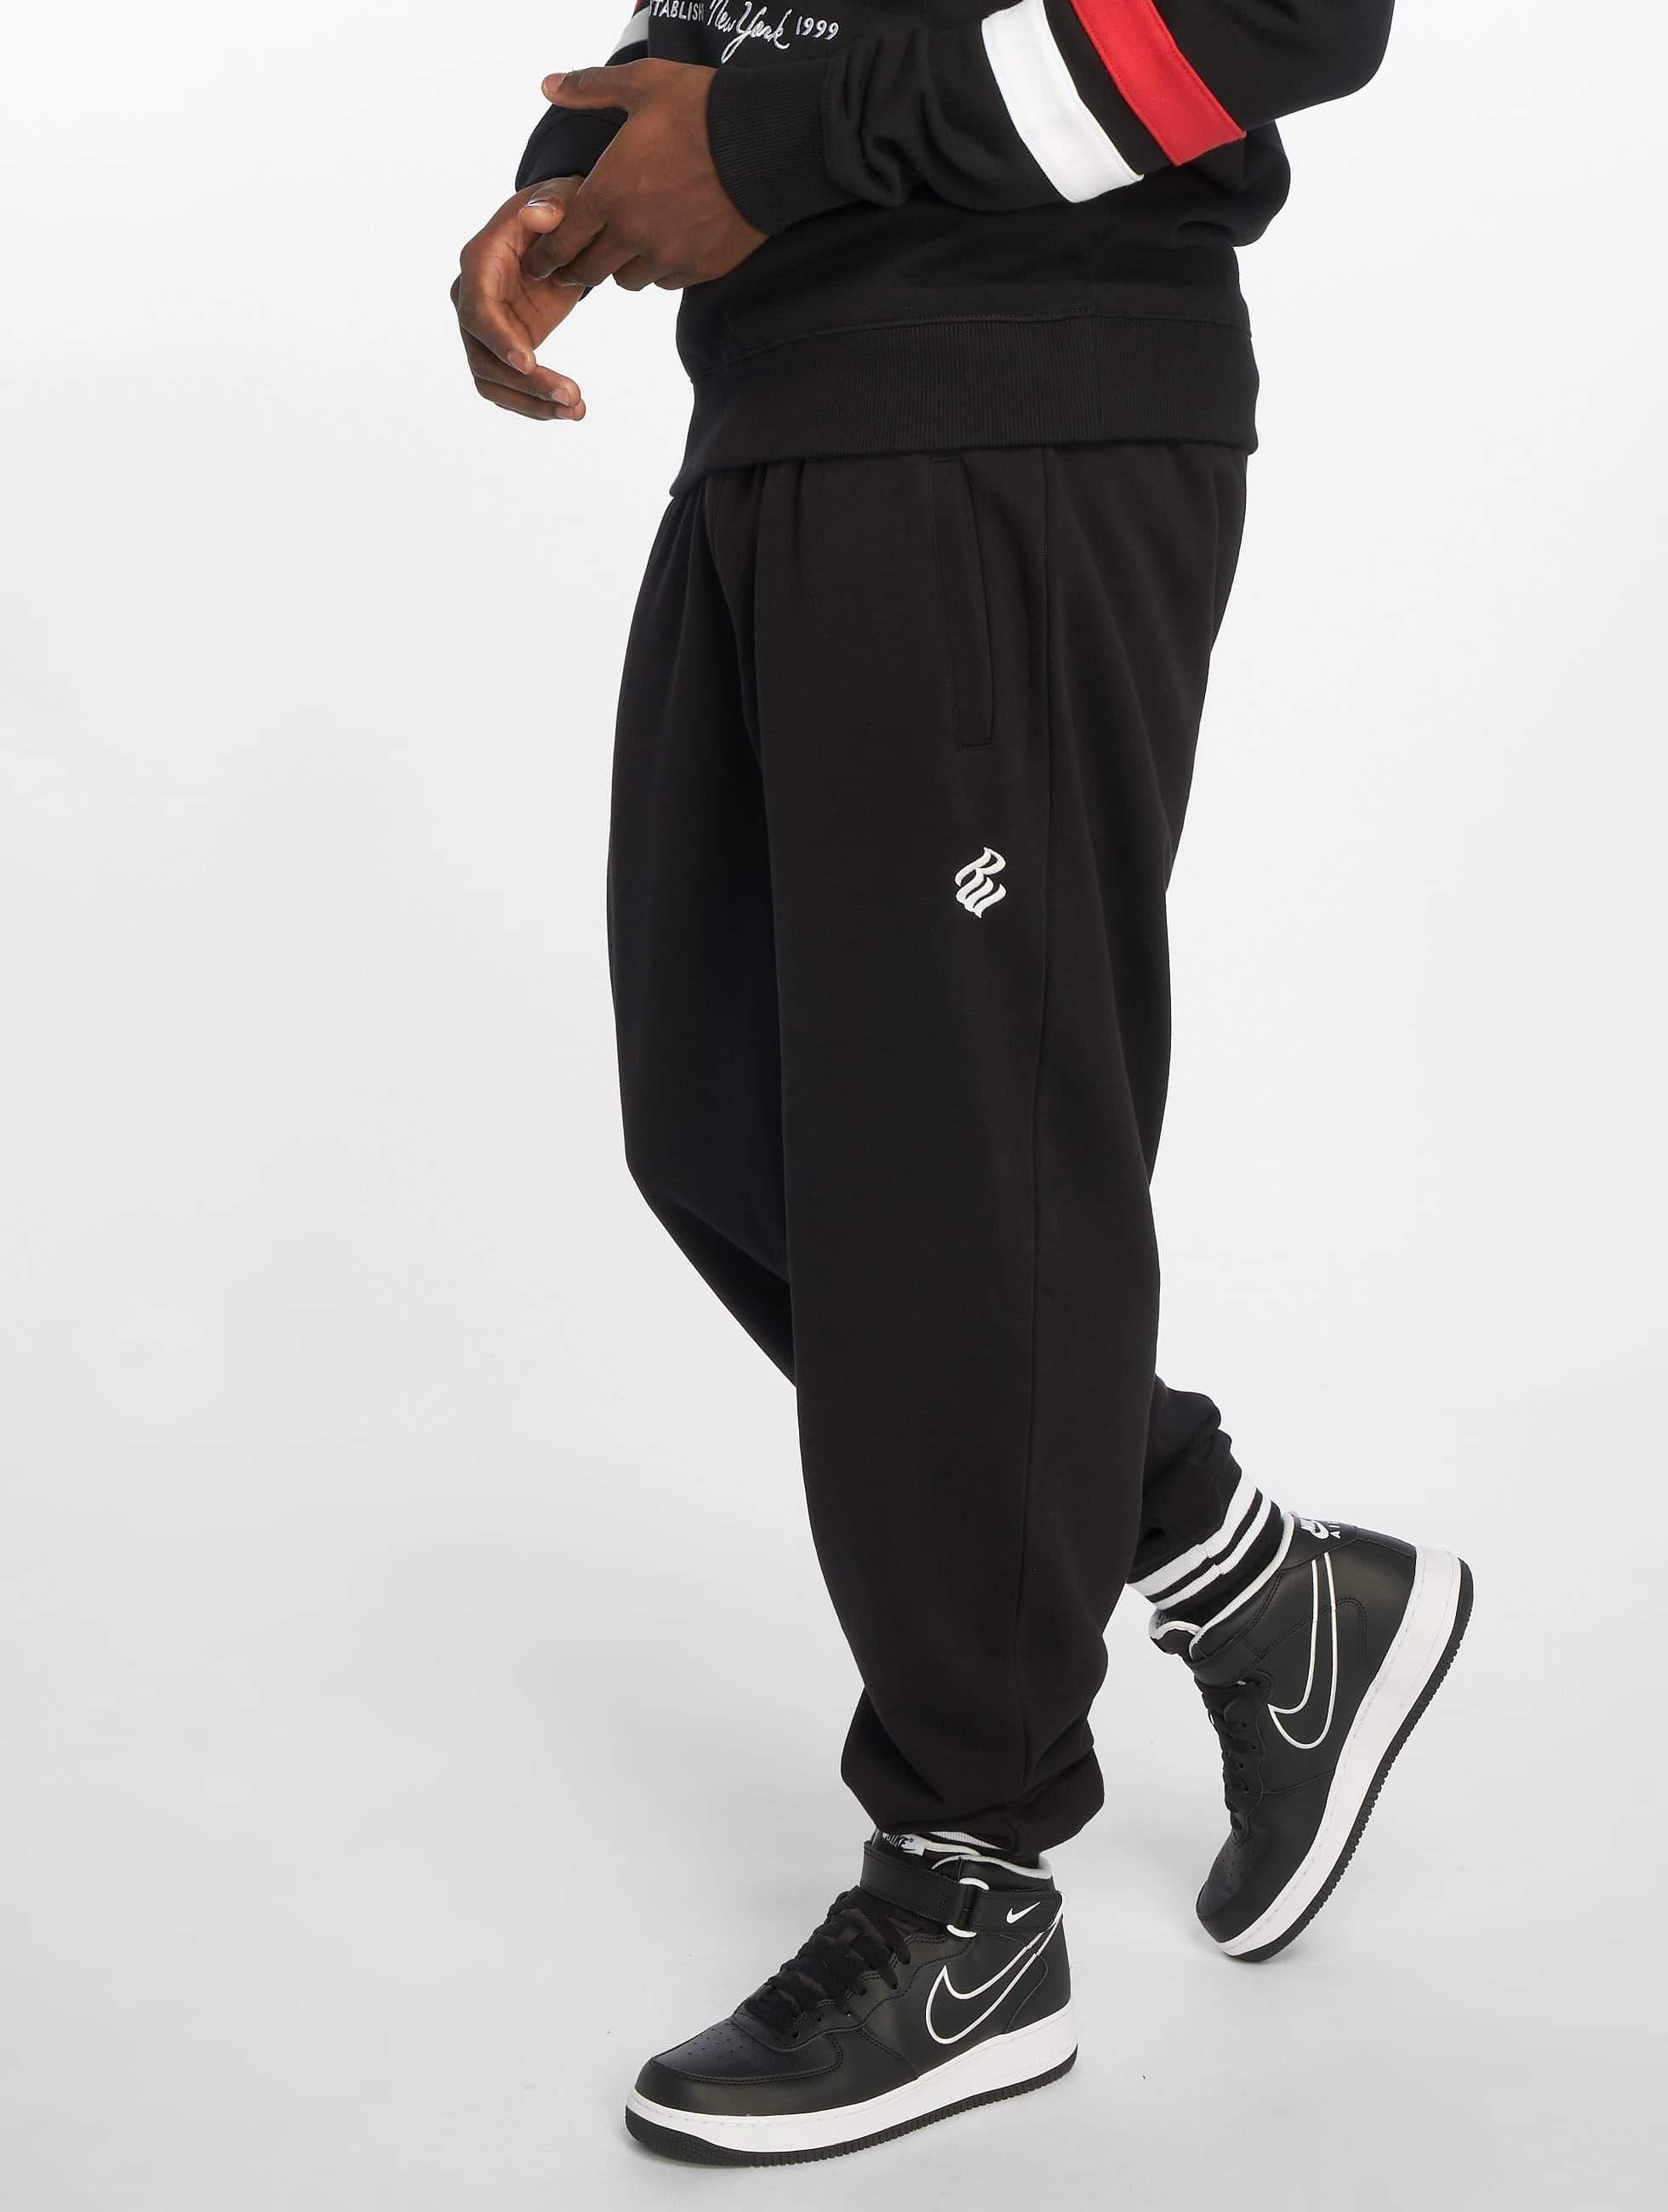 Rocawear / Sweat Pant Block in black 3XL